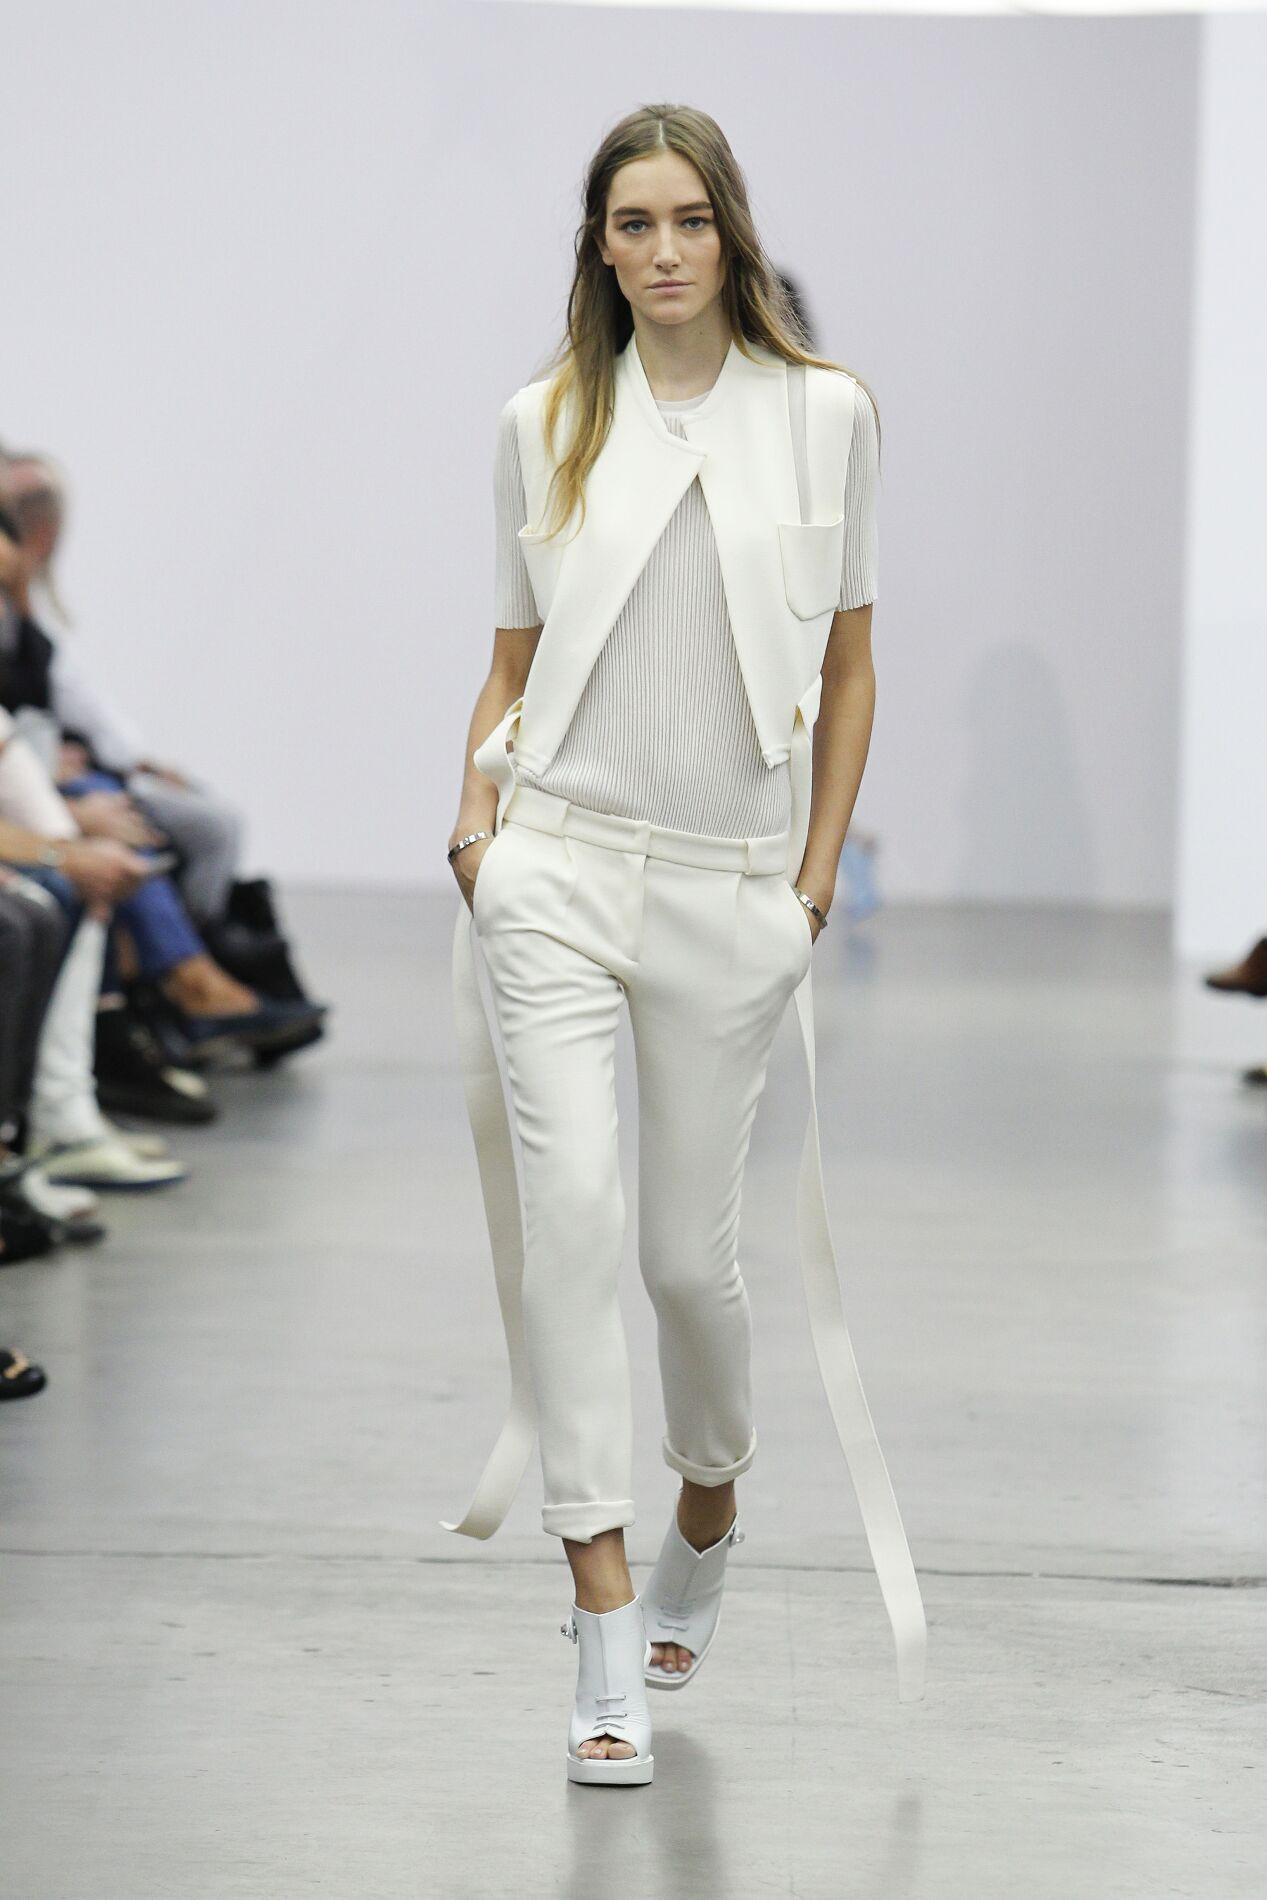 Summer 2014 Fashion Trends Iceberg